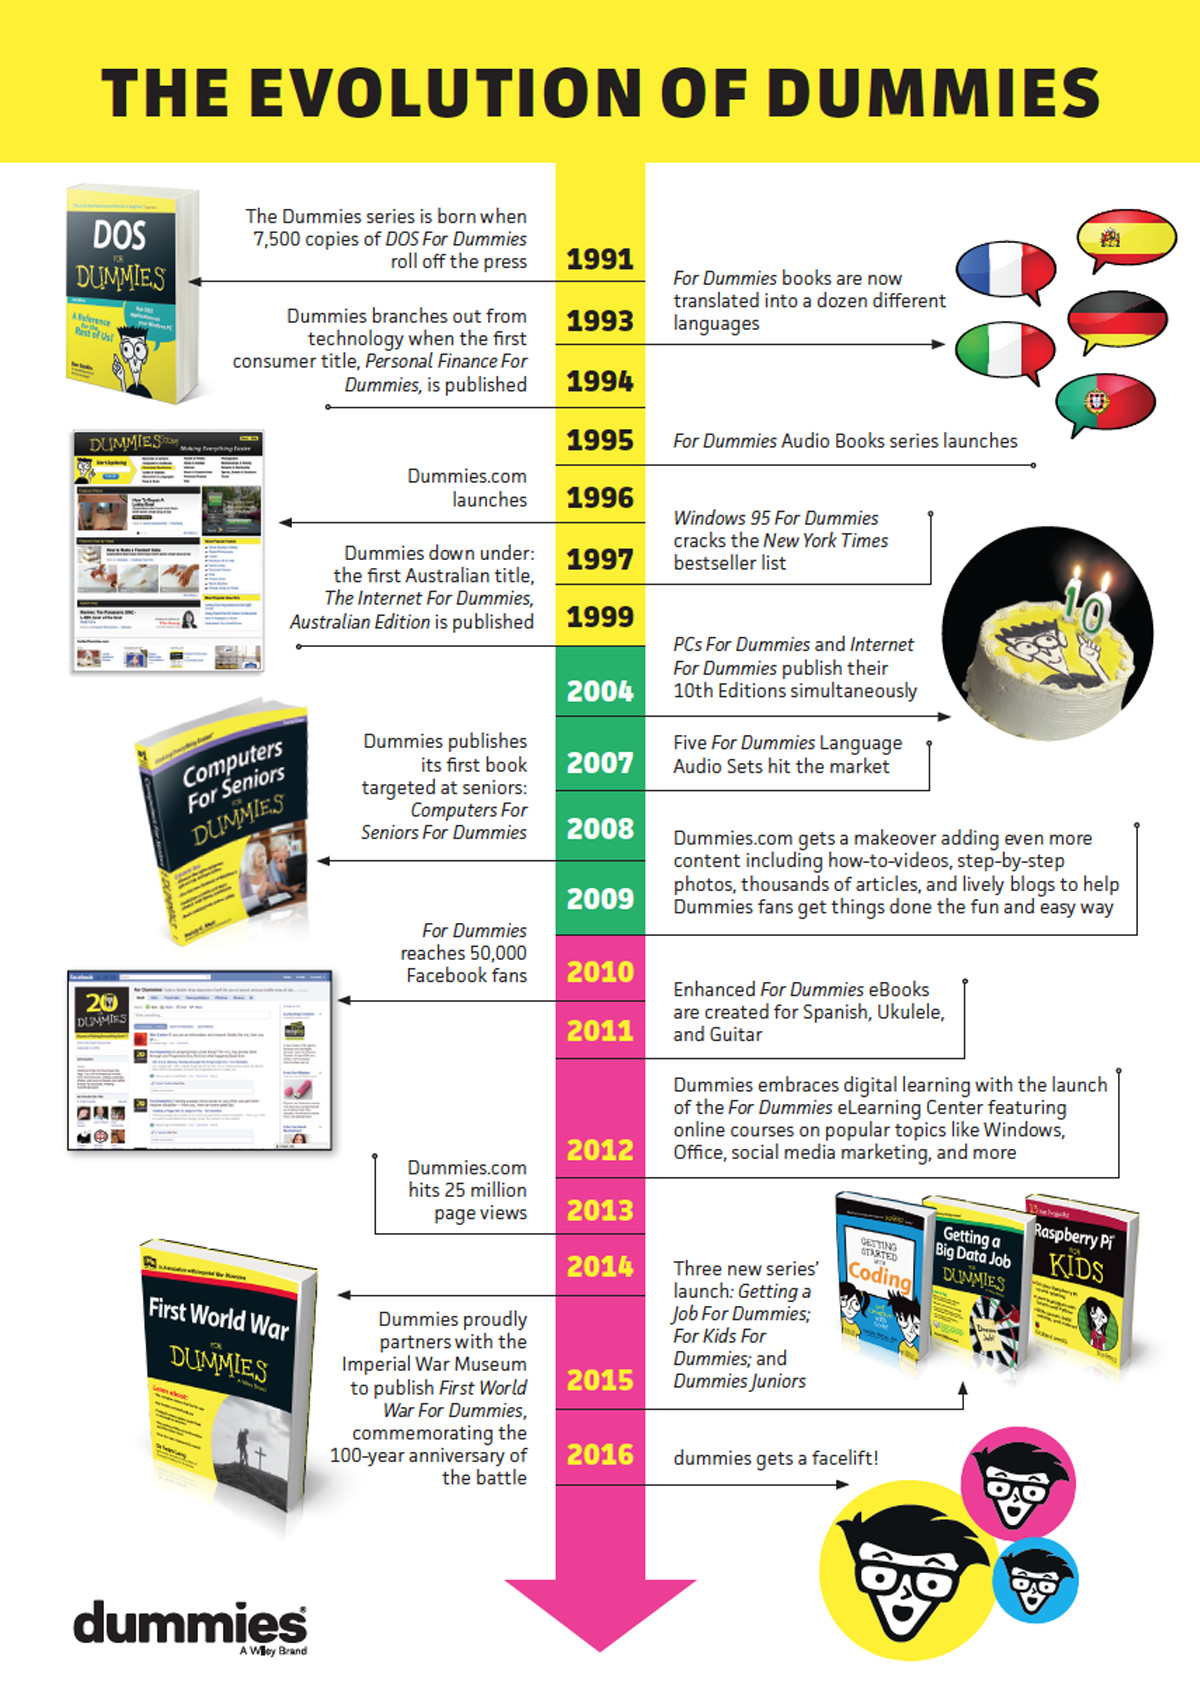 dummies Evolution Infographic